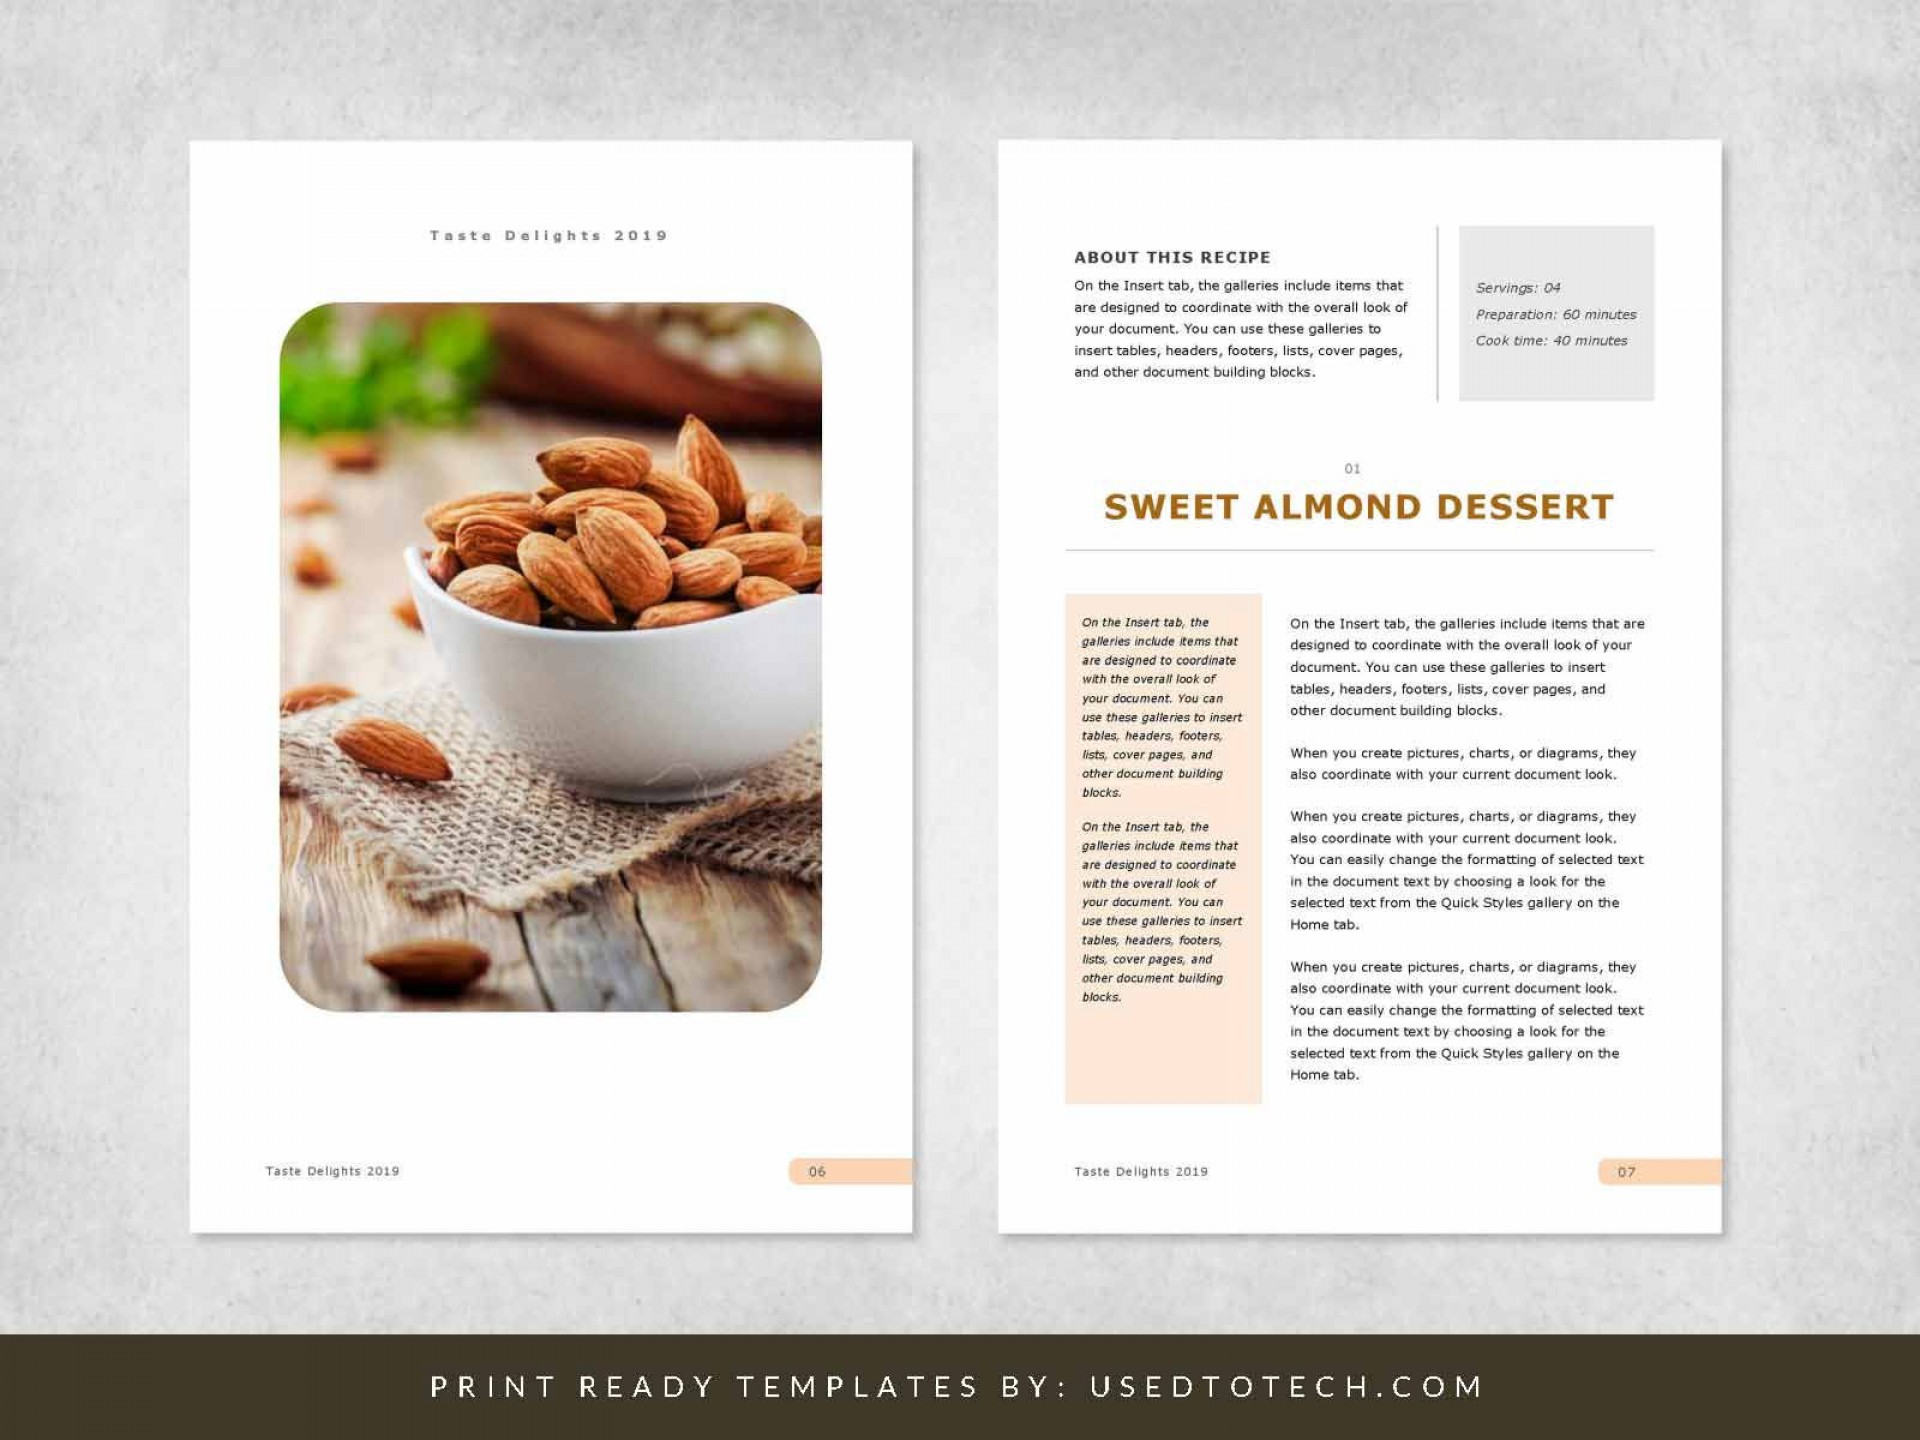 001 Astounding Recipe Book Template Word Photo  Mac Free Microsoft1920